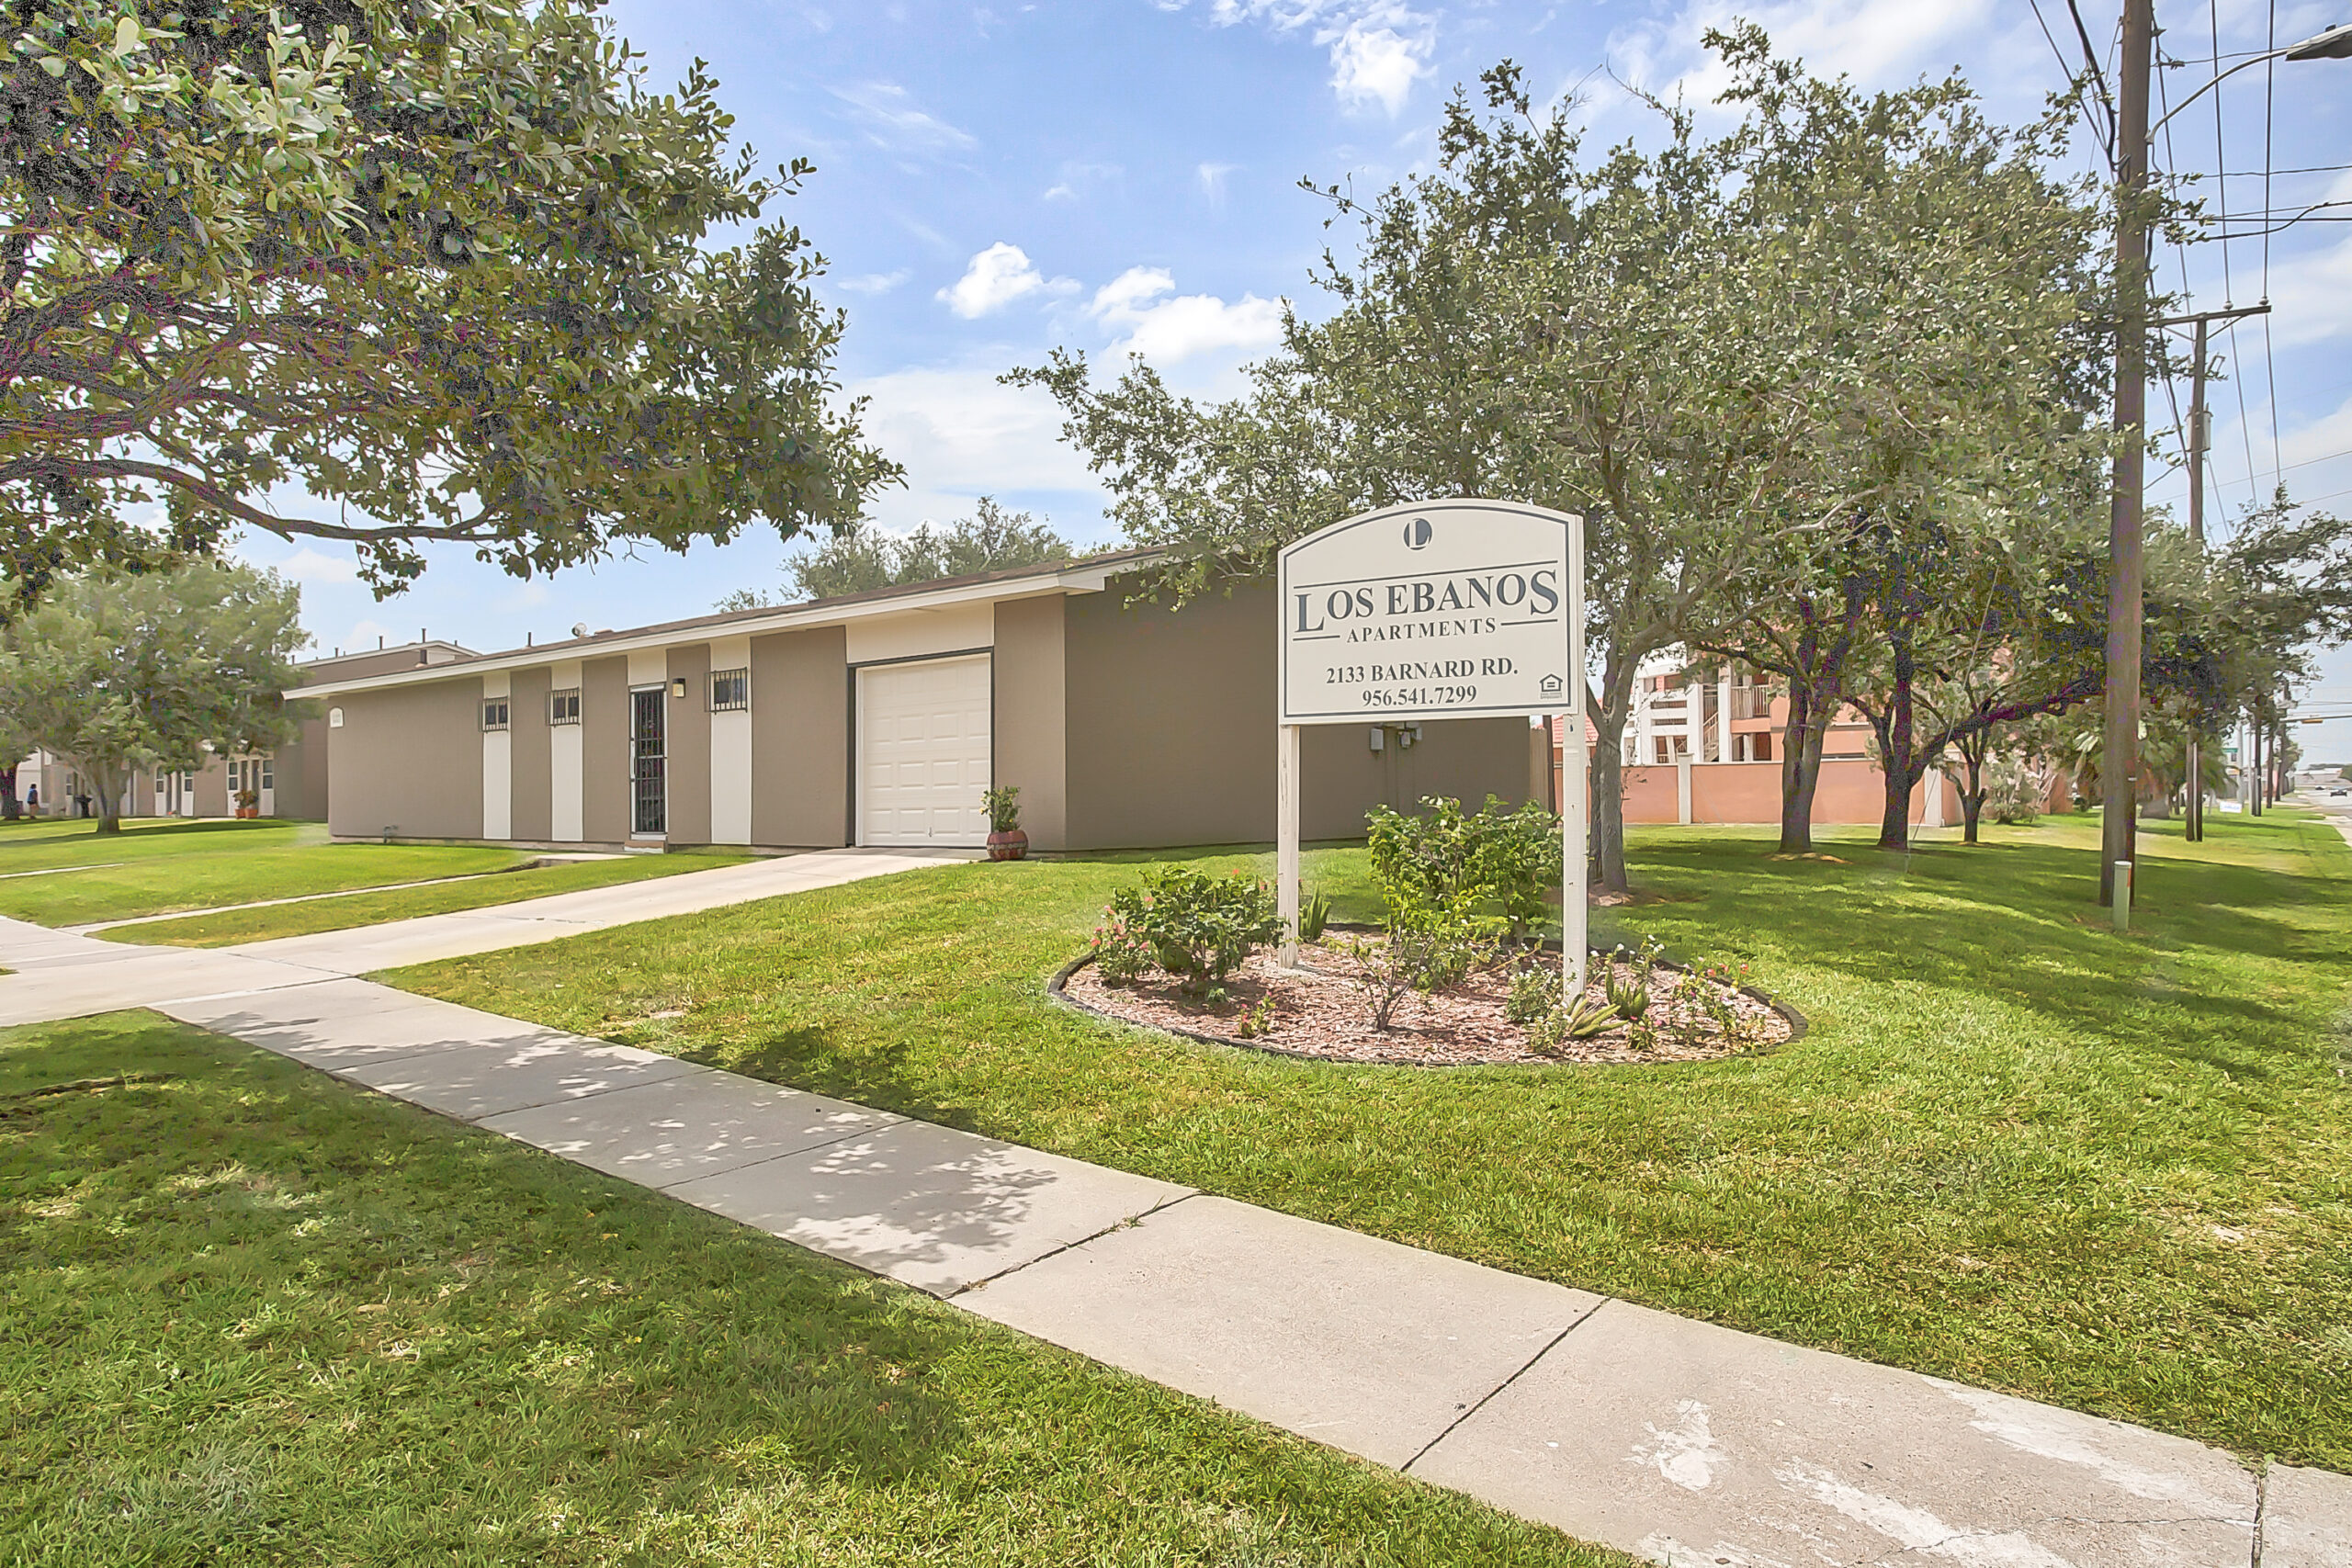 Front Property Sign_2133_Barnard_RD-Brownsville_TX_Los-Ebanos-Apartments_RPI_II-315431-34